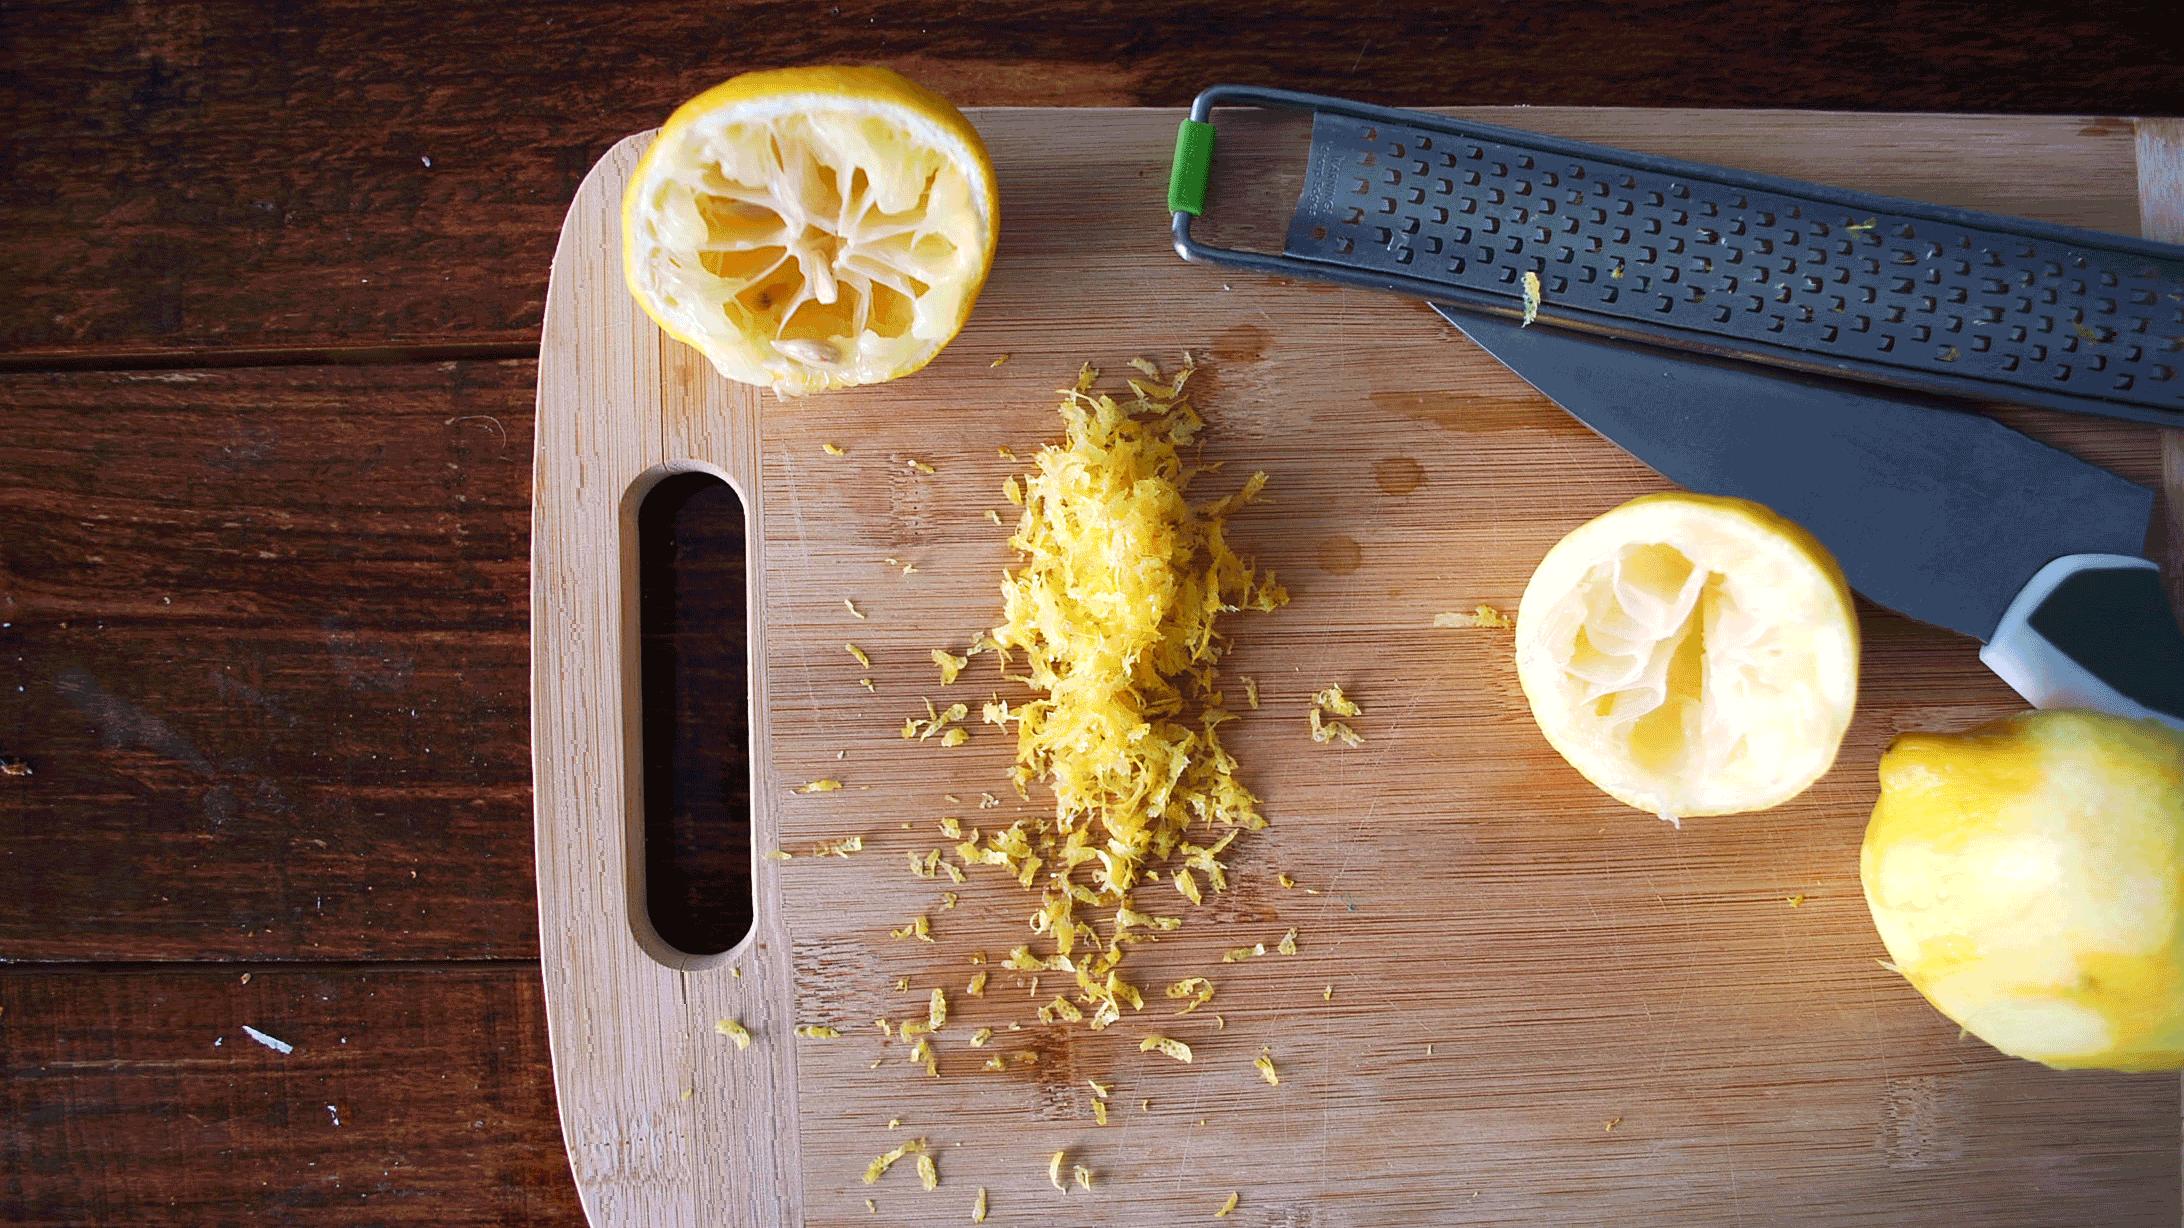 kitchen-whiskers-lemon-glaze